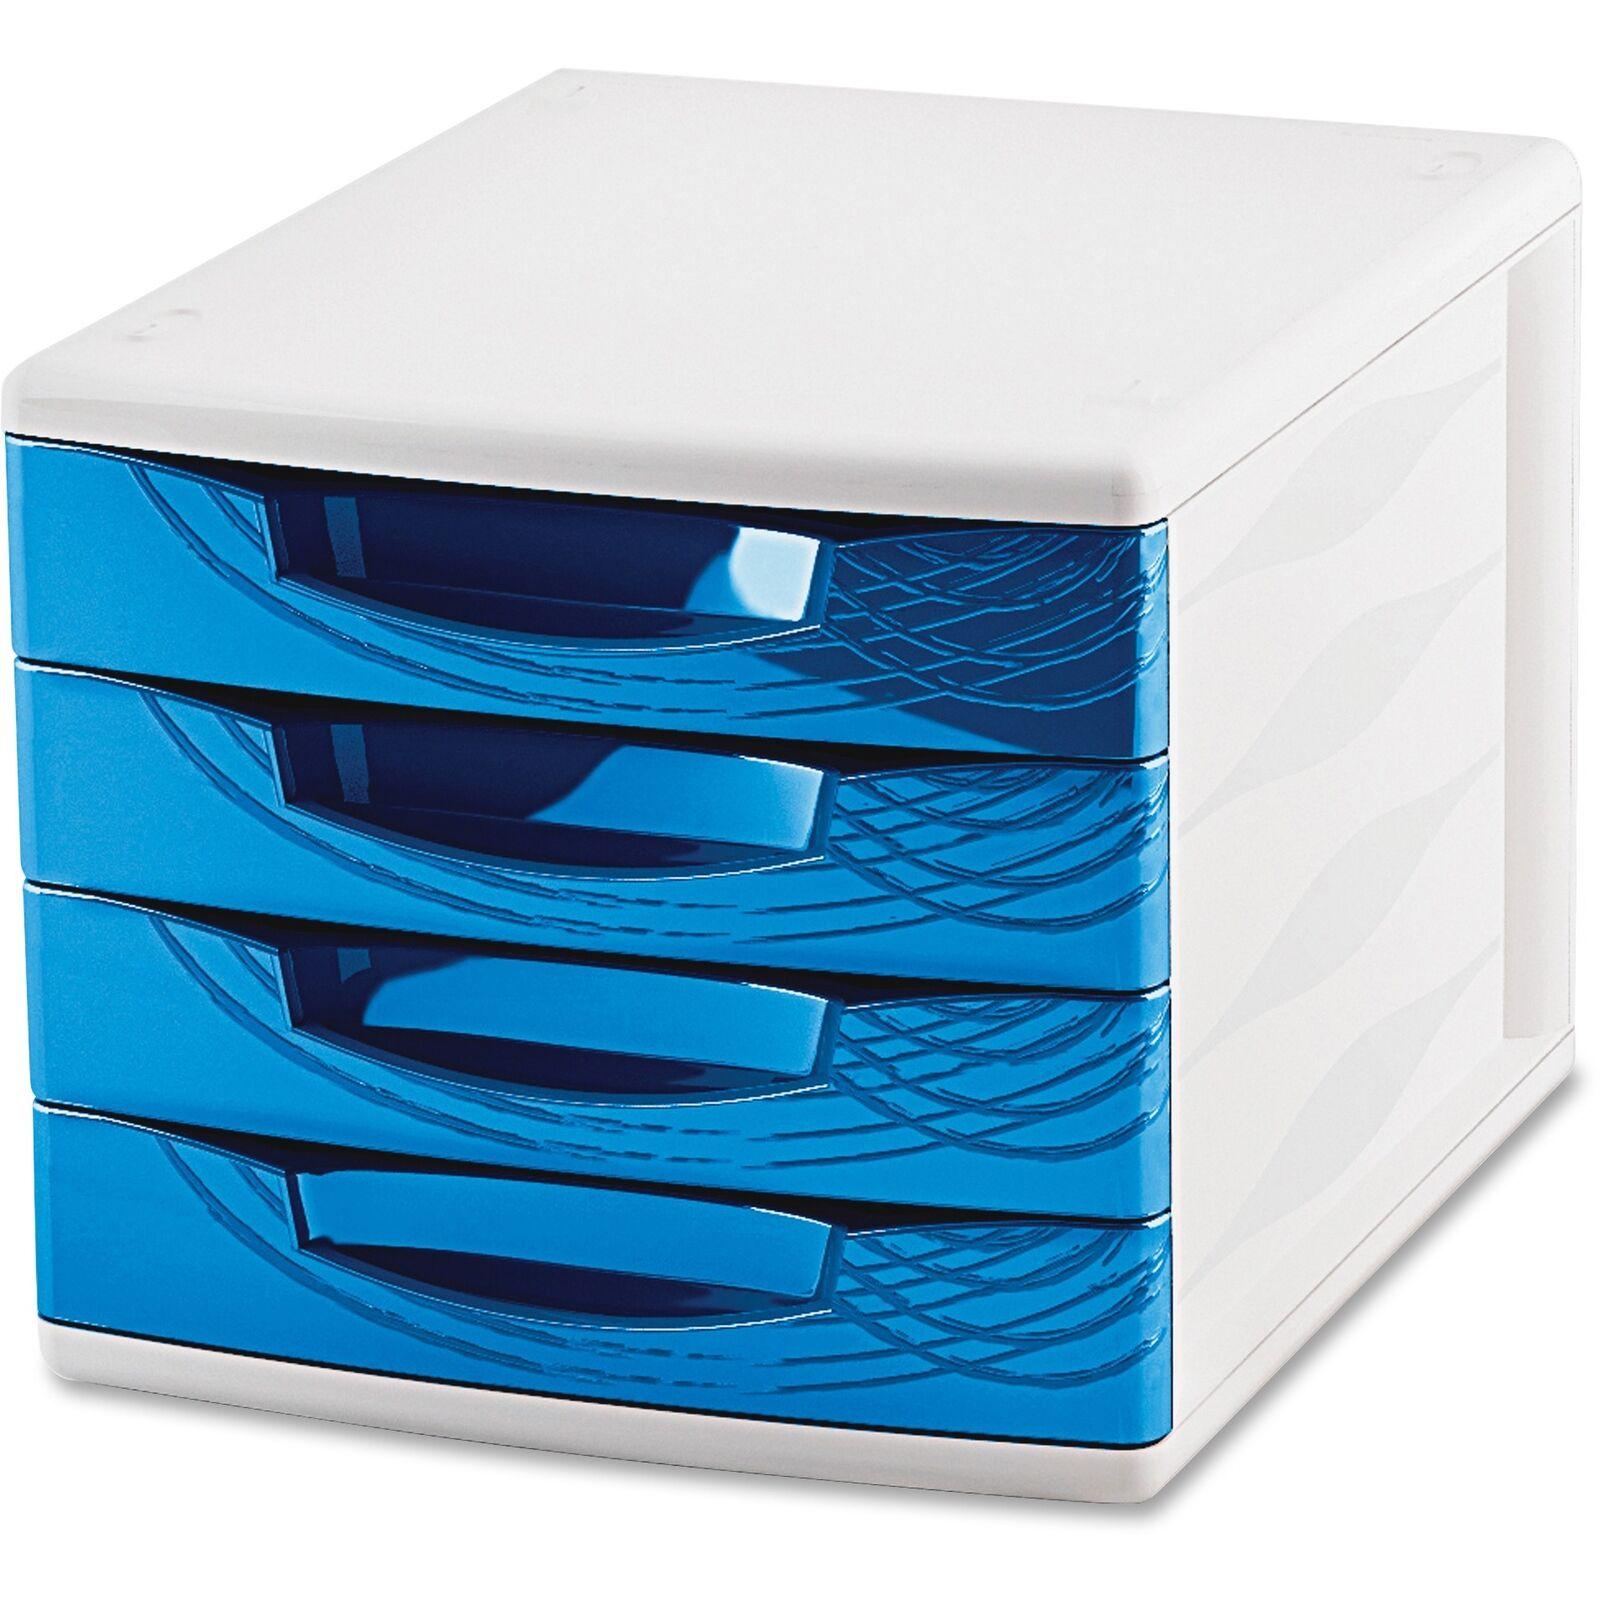 CEP 4-Drawer Module 11-4 5 x14-1 2 x10-2 5  bluee 1064000351